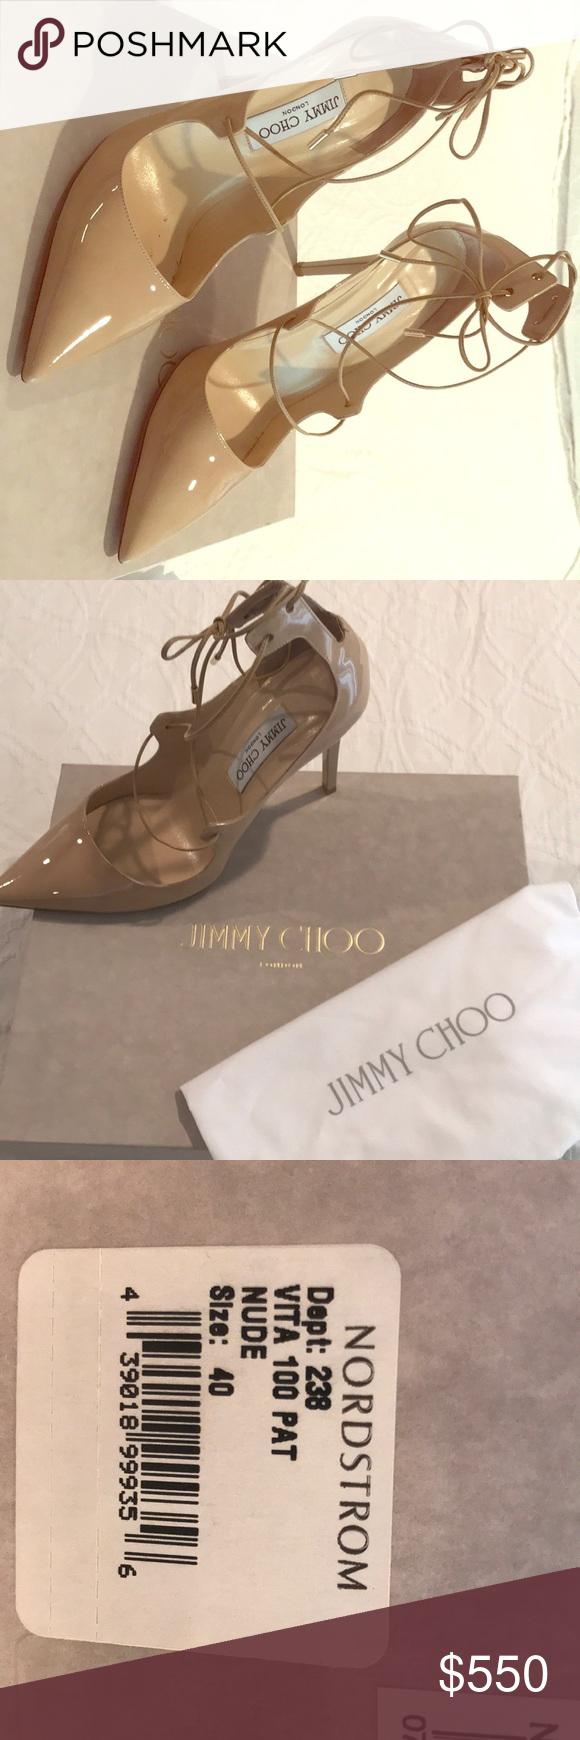 ffed21b3c3d5 Jimmy Choo Vita Lace Pump Jimmy Choo Vita EXCELLENT Condition.